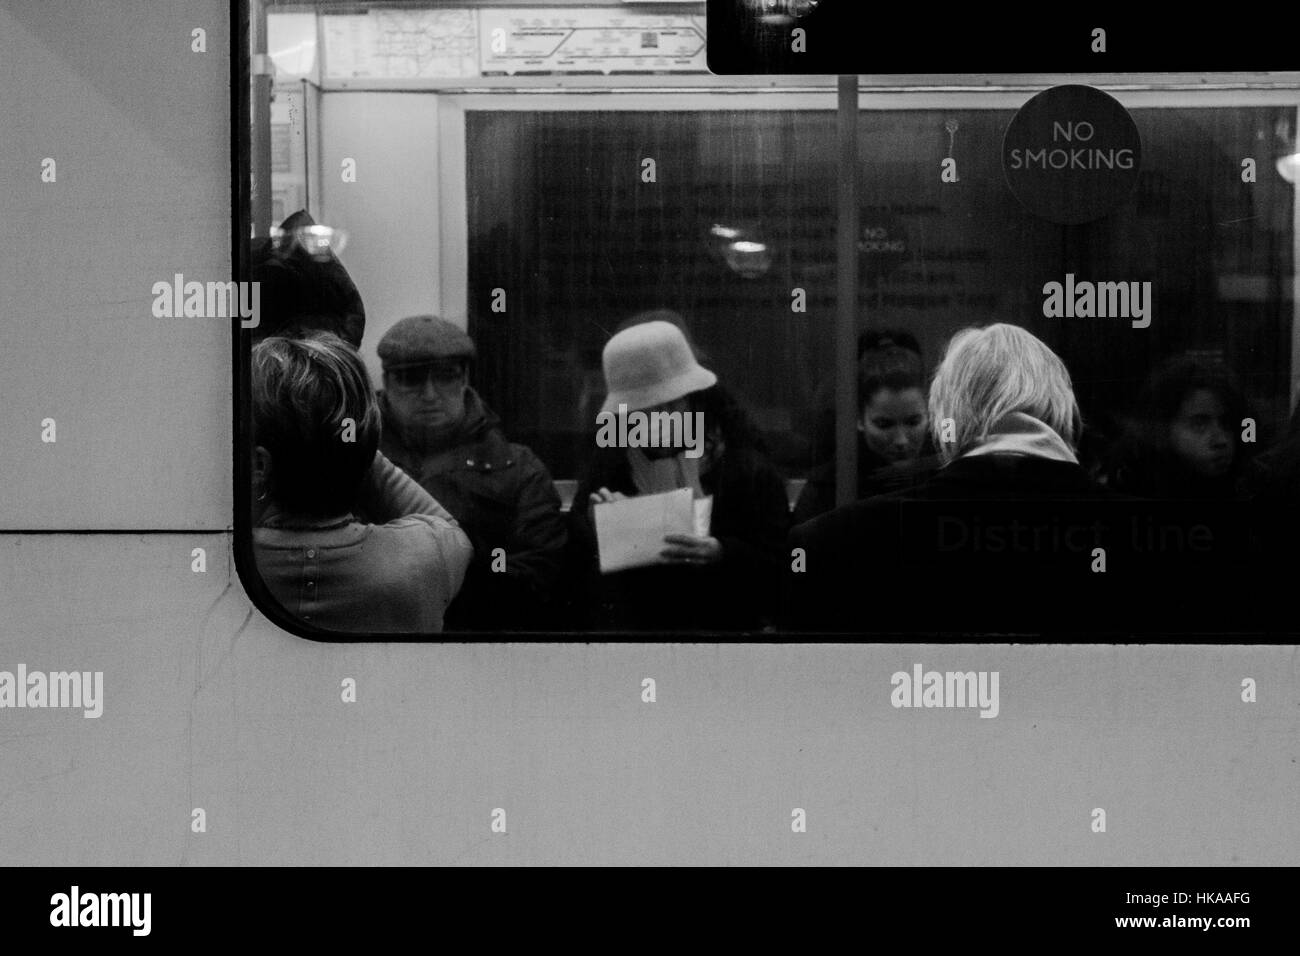 Commuters travel on the tube. London, UK. - Stock Image